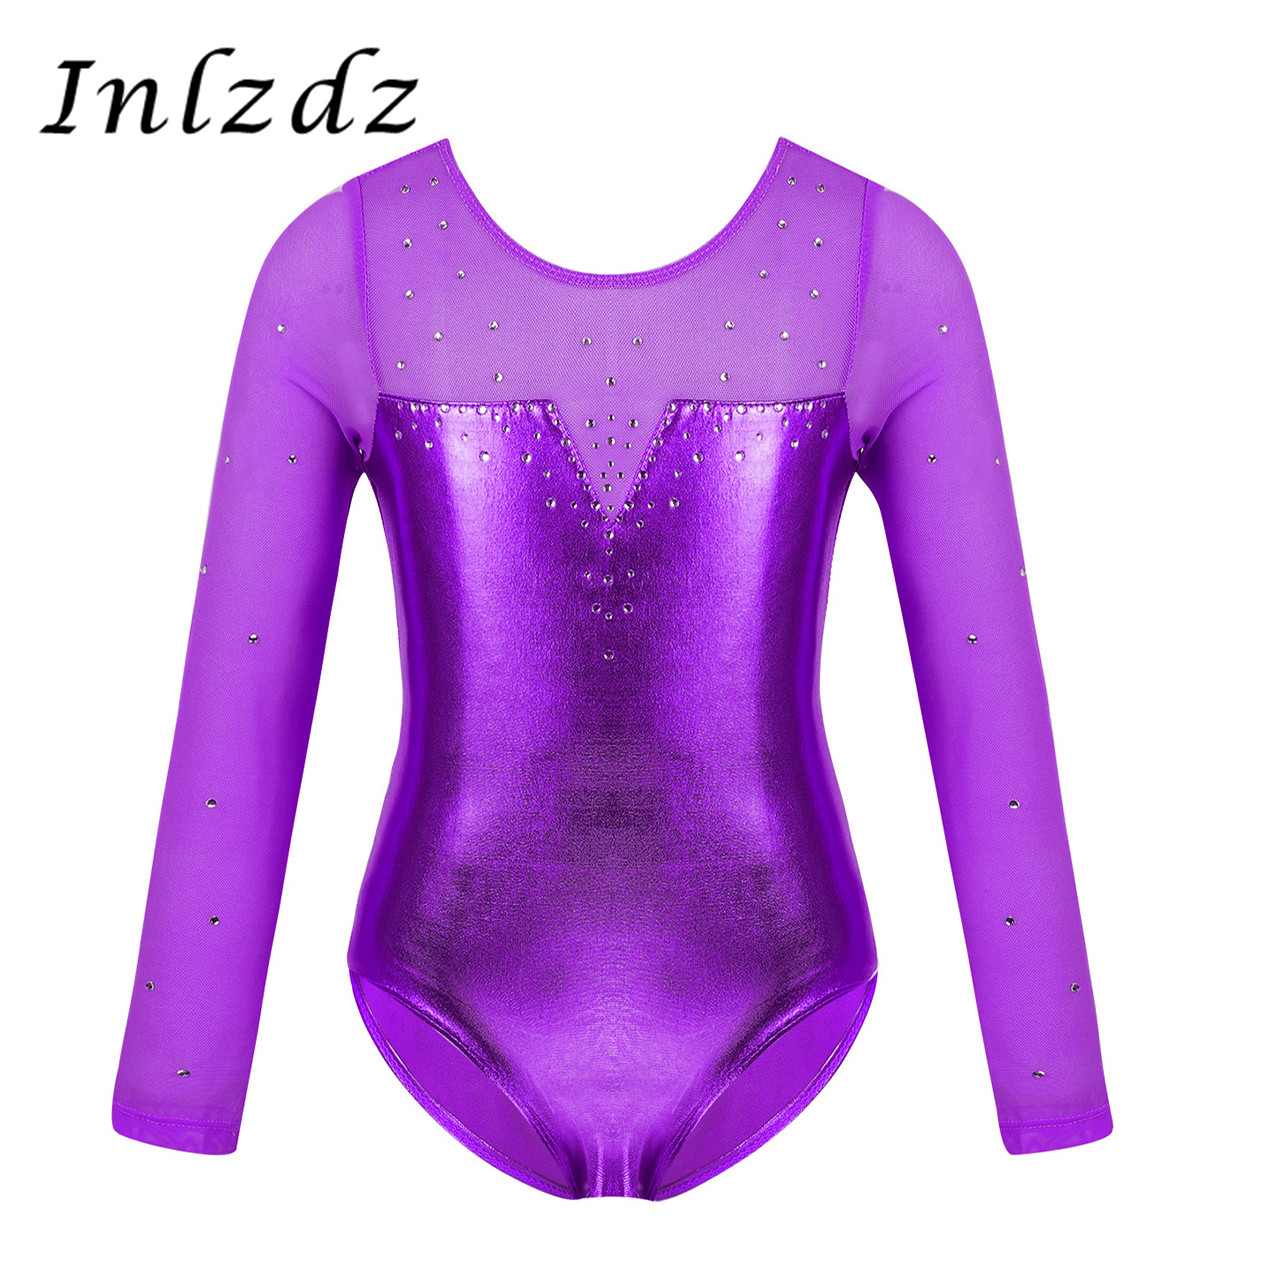 Girls Round Neck Long Sleeve Bodysuit Childrens Gymnastics Leotard Top Pack Of 6